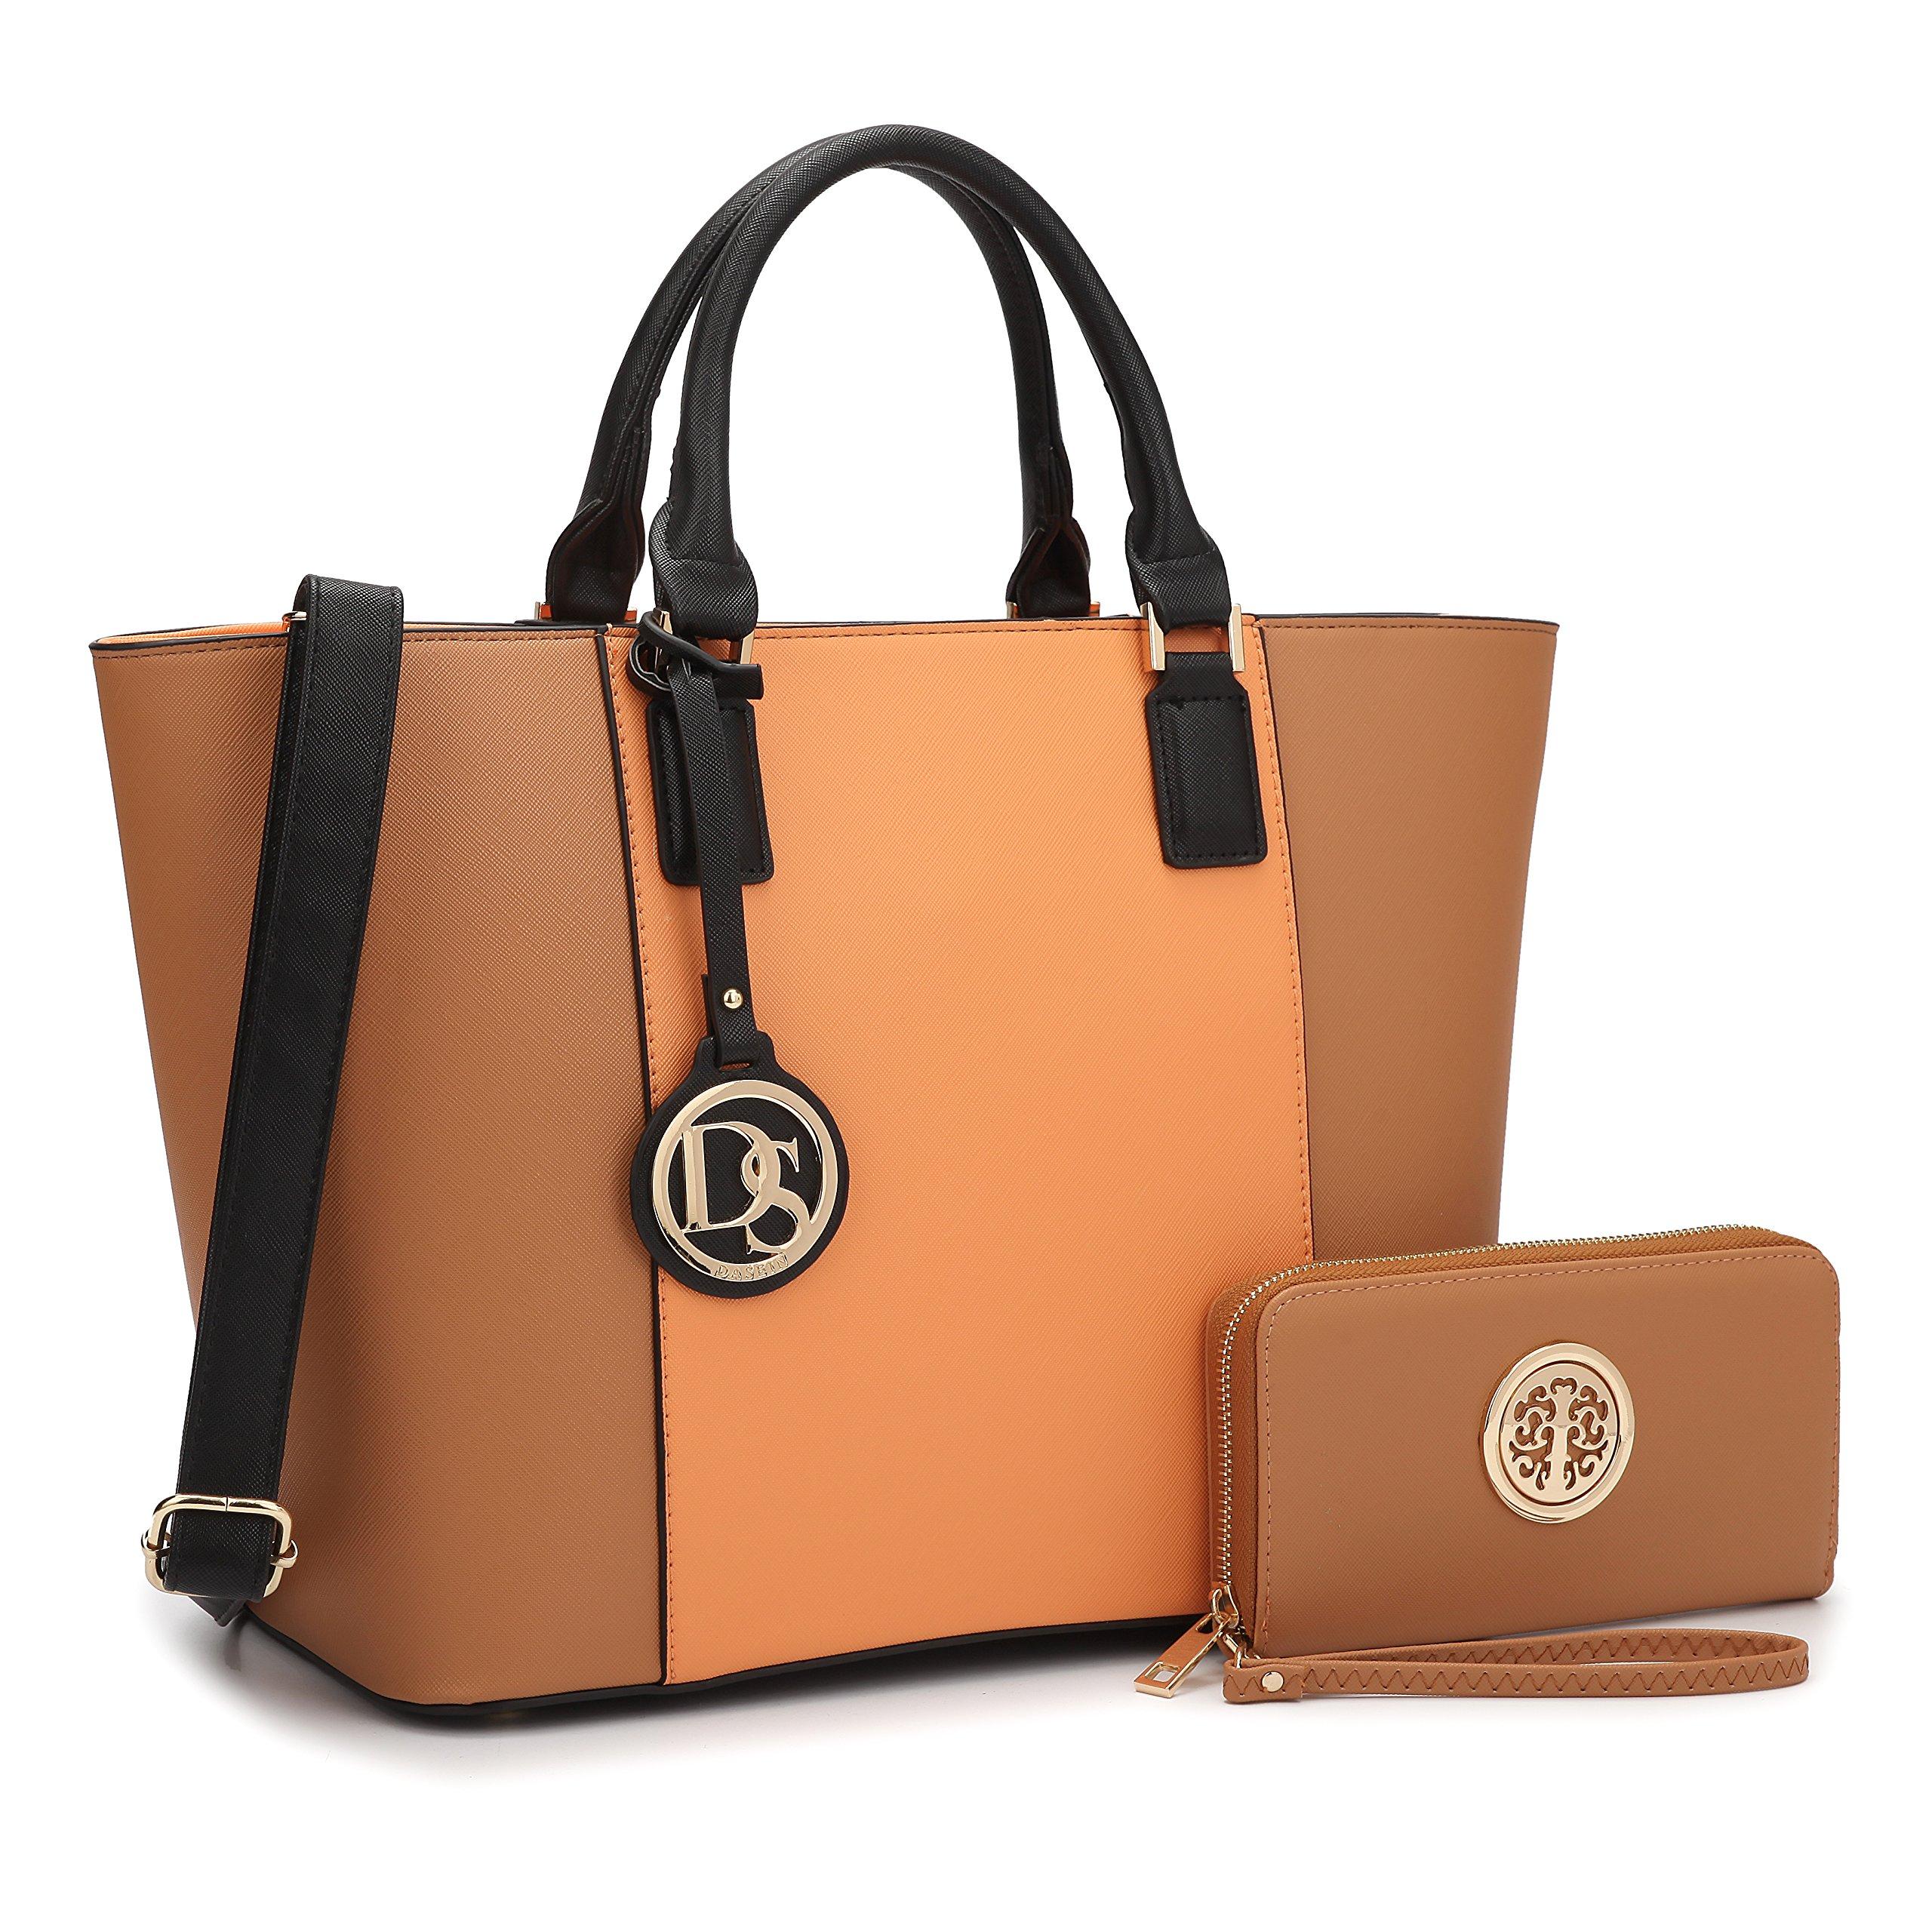 Dasein Women's Top Handle Structured Two Tone Tote Bag Satchel Handbag Shoulder Bag With Shoulder Strap (6417 Orange/Brown)